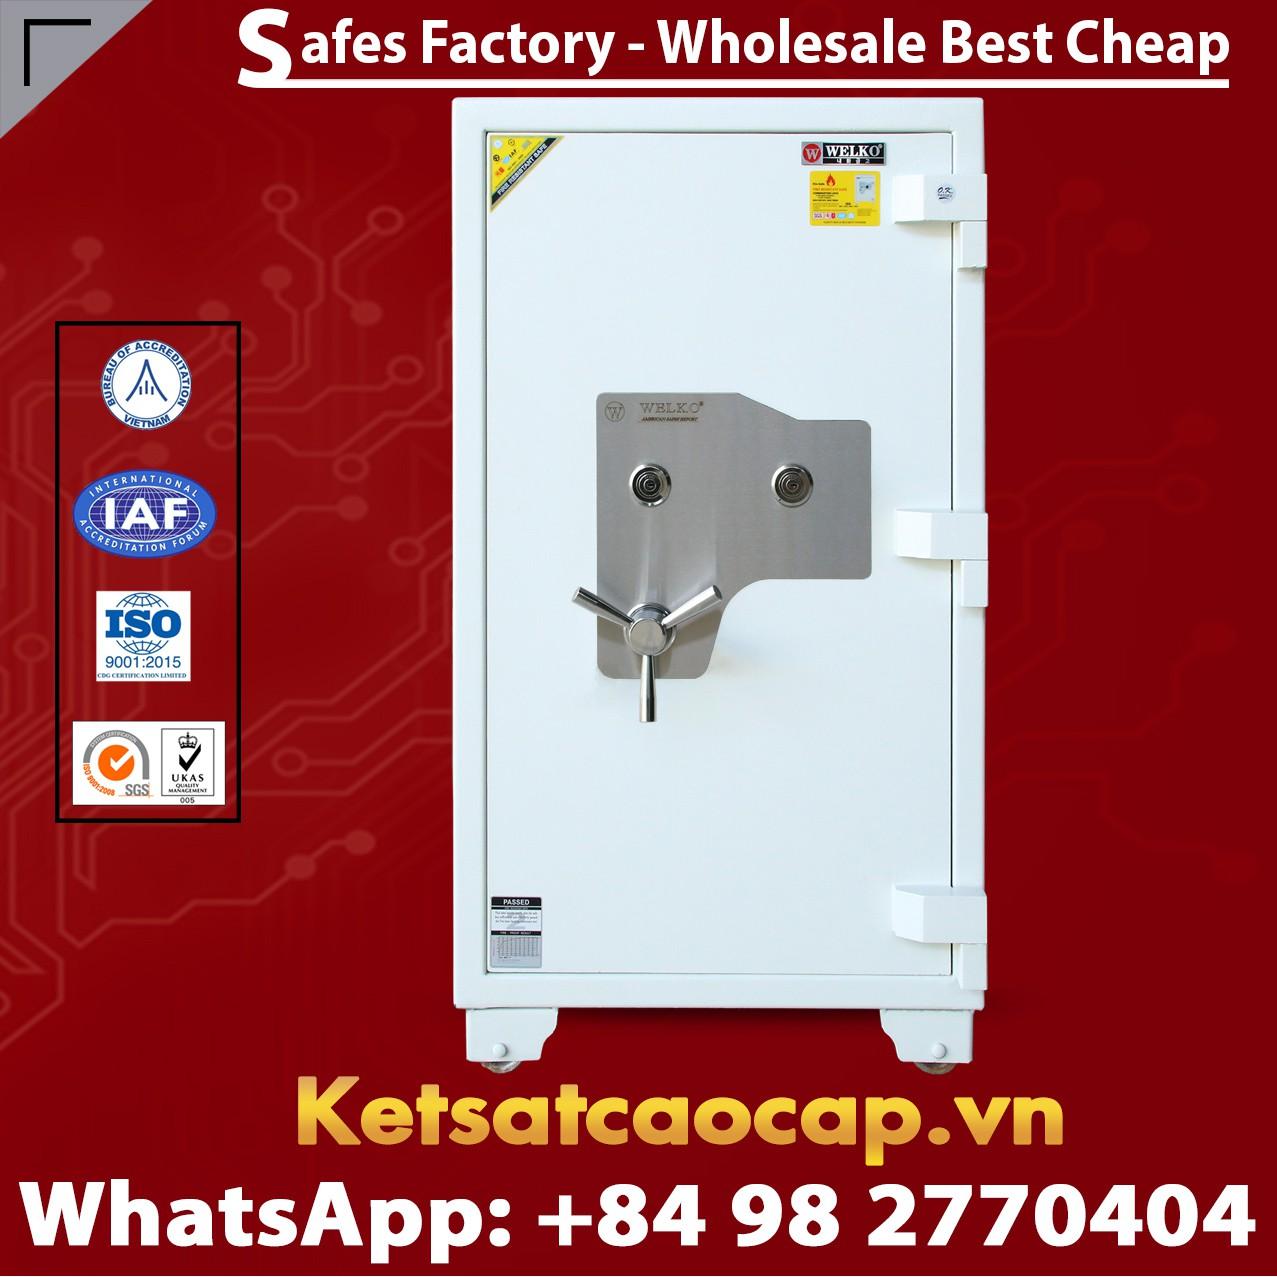 Safes Box Company WELKO US1080 KEY Pro